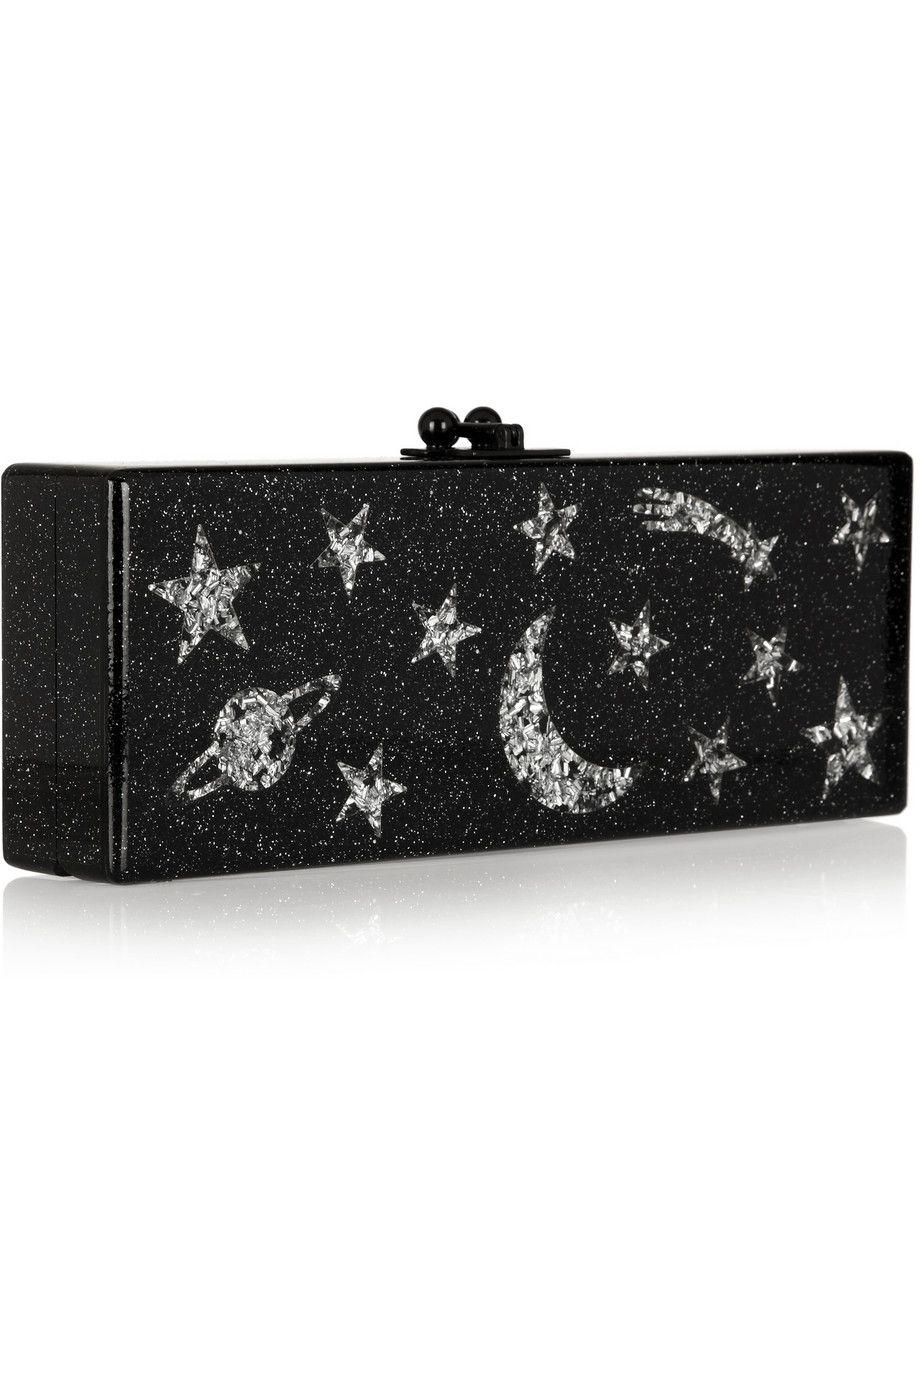 EDIE PARKER Flavia Solar System glittered acrylic box clutch £1,280